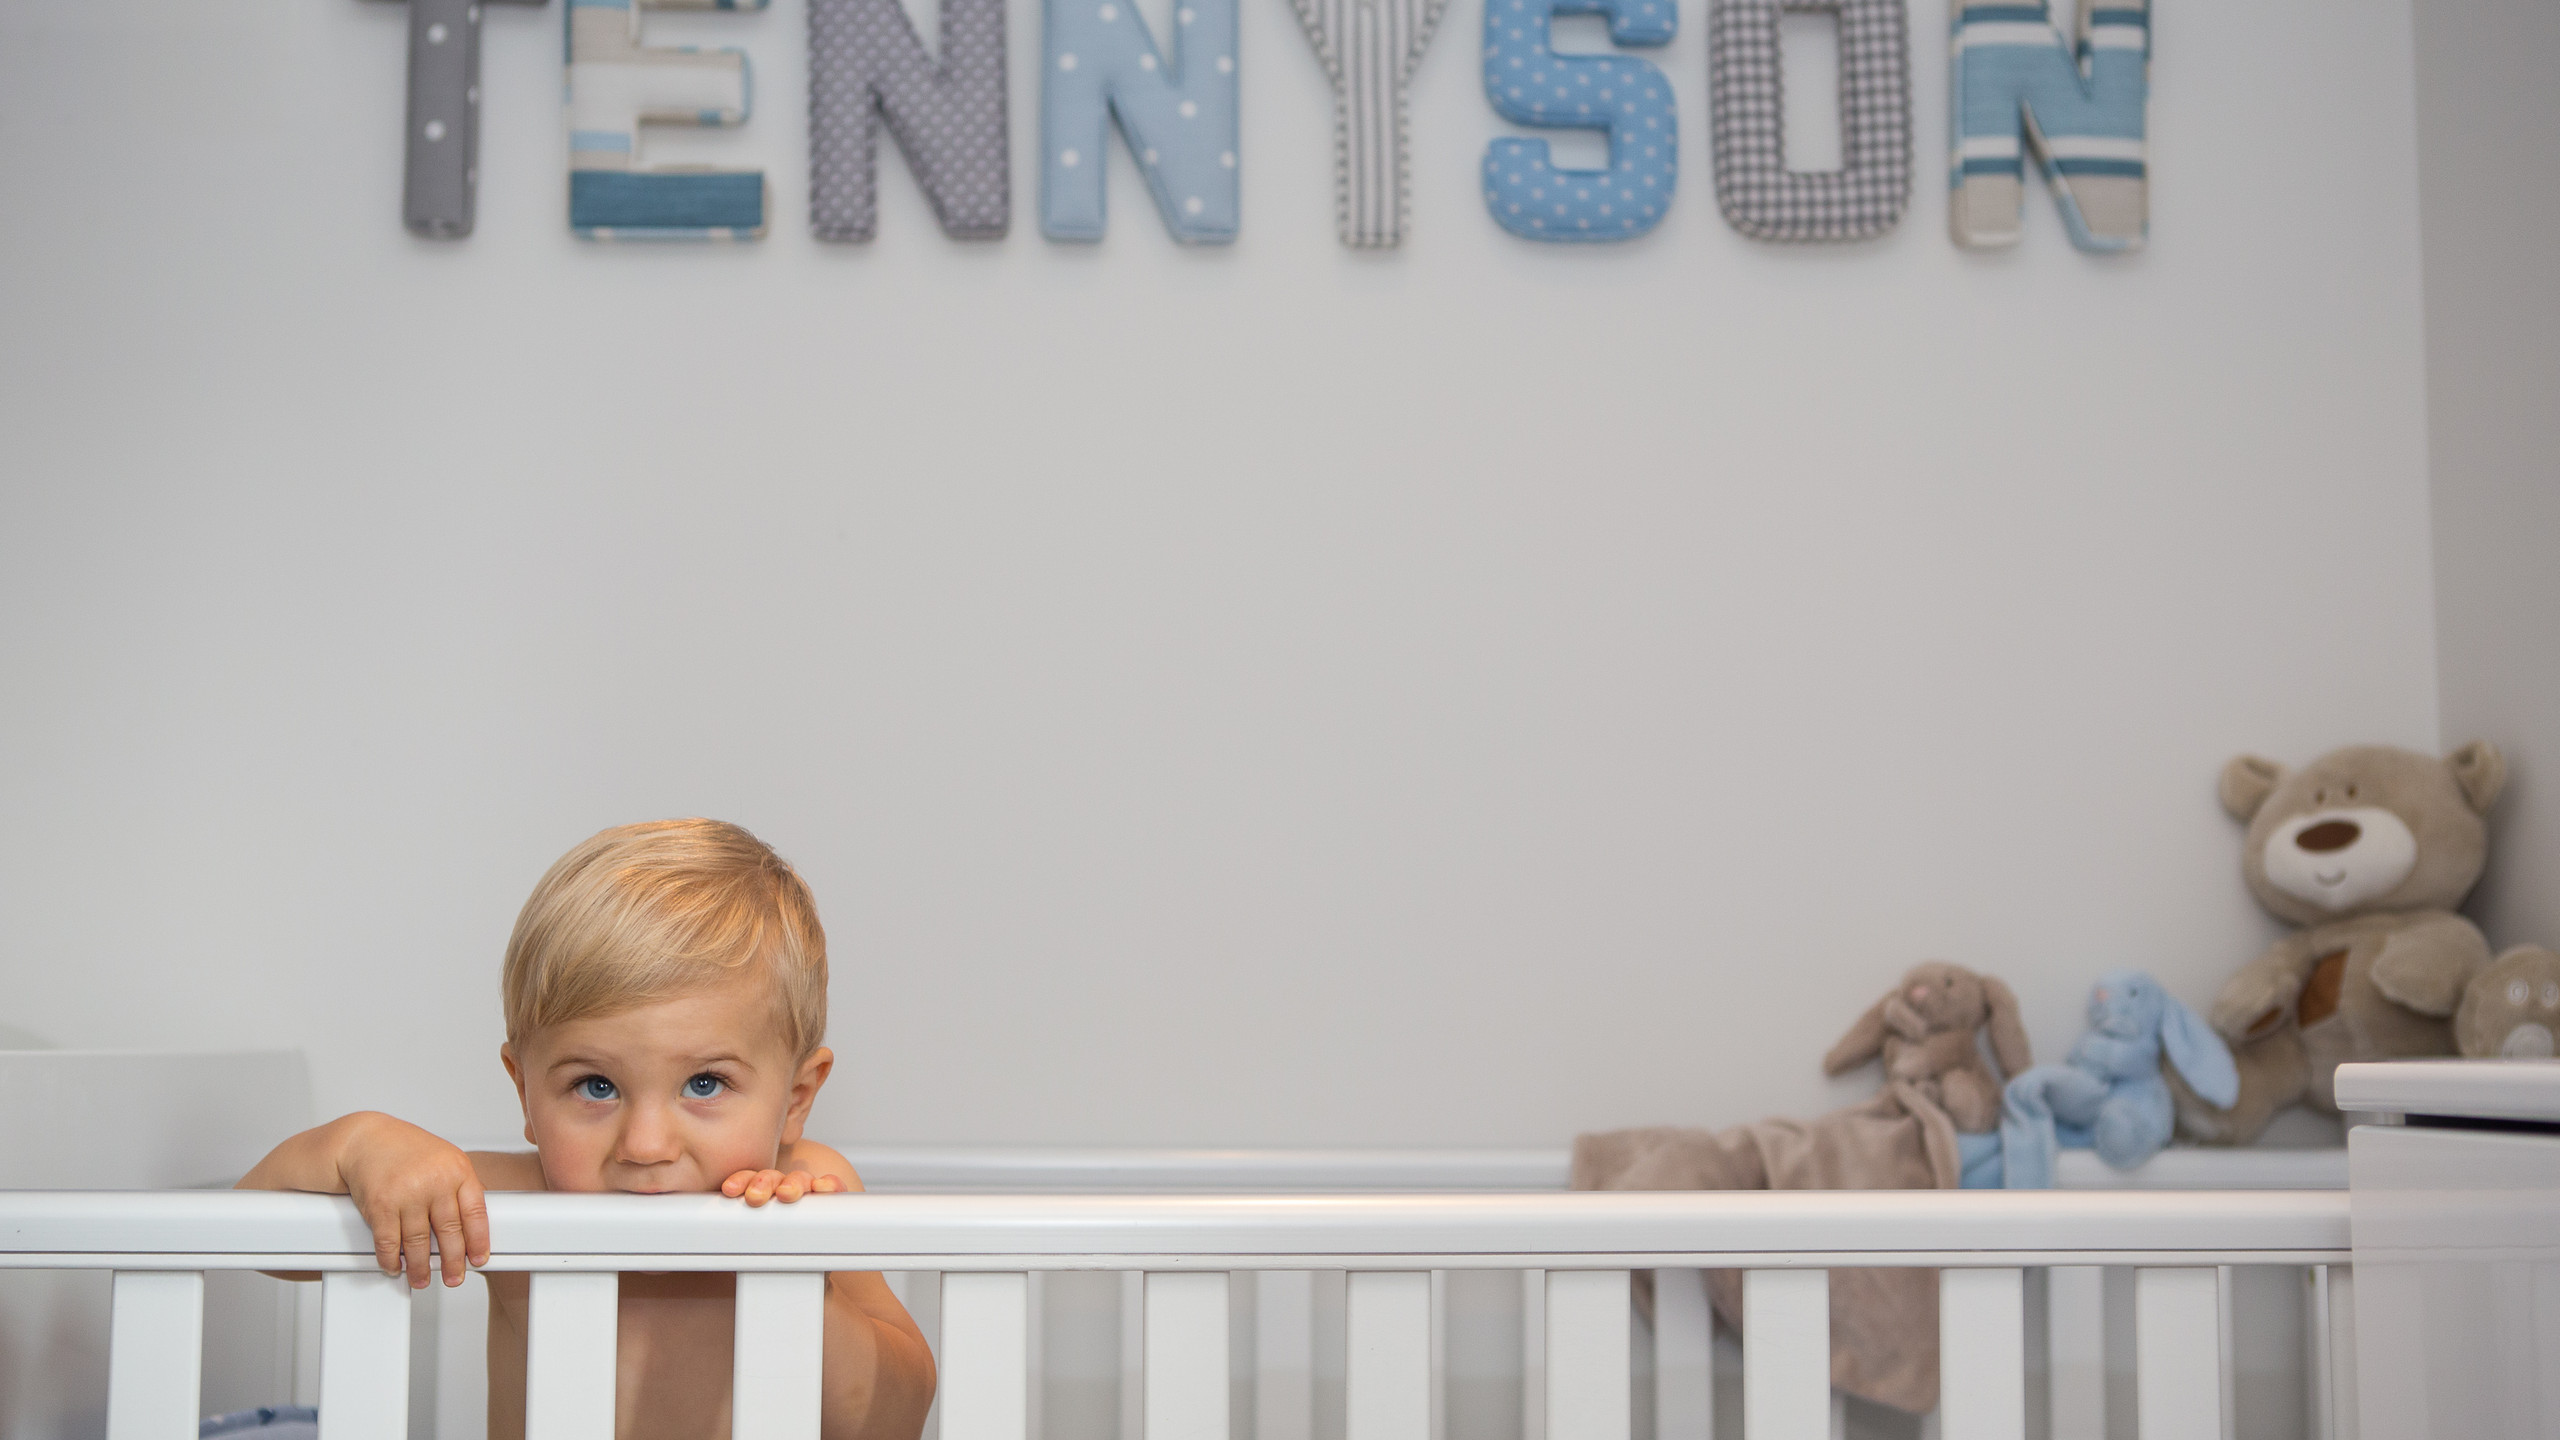 Toddler Lifestyle Photoshoot Bedroom